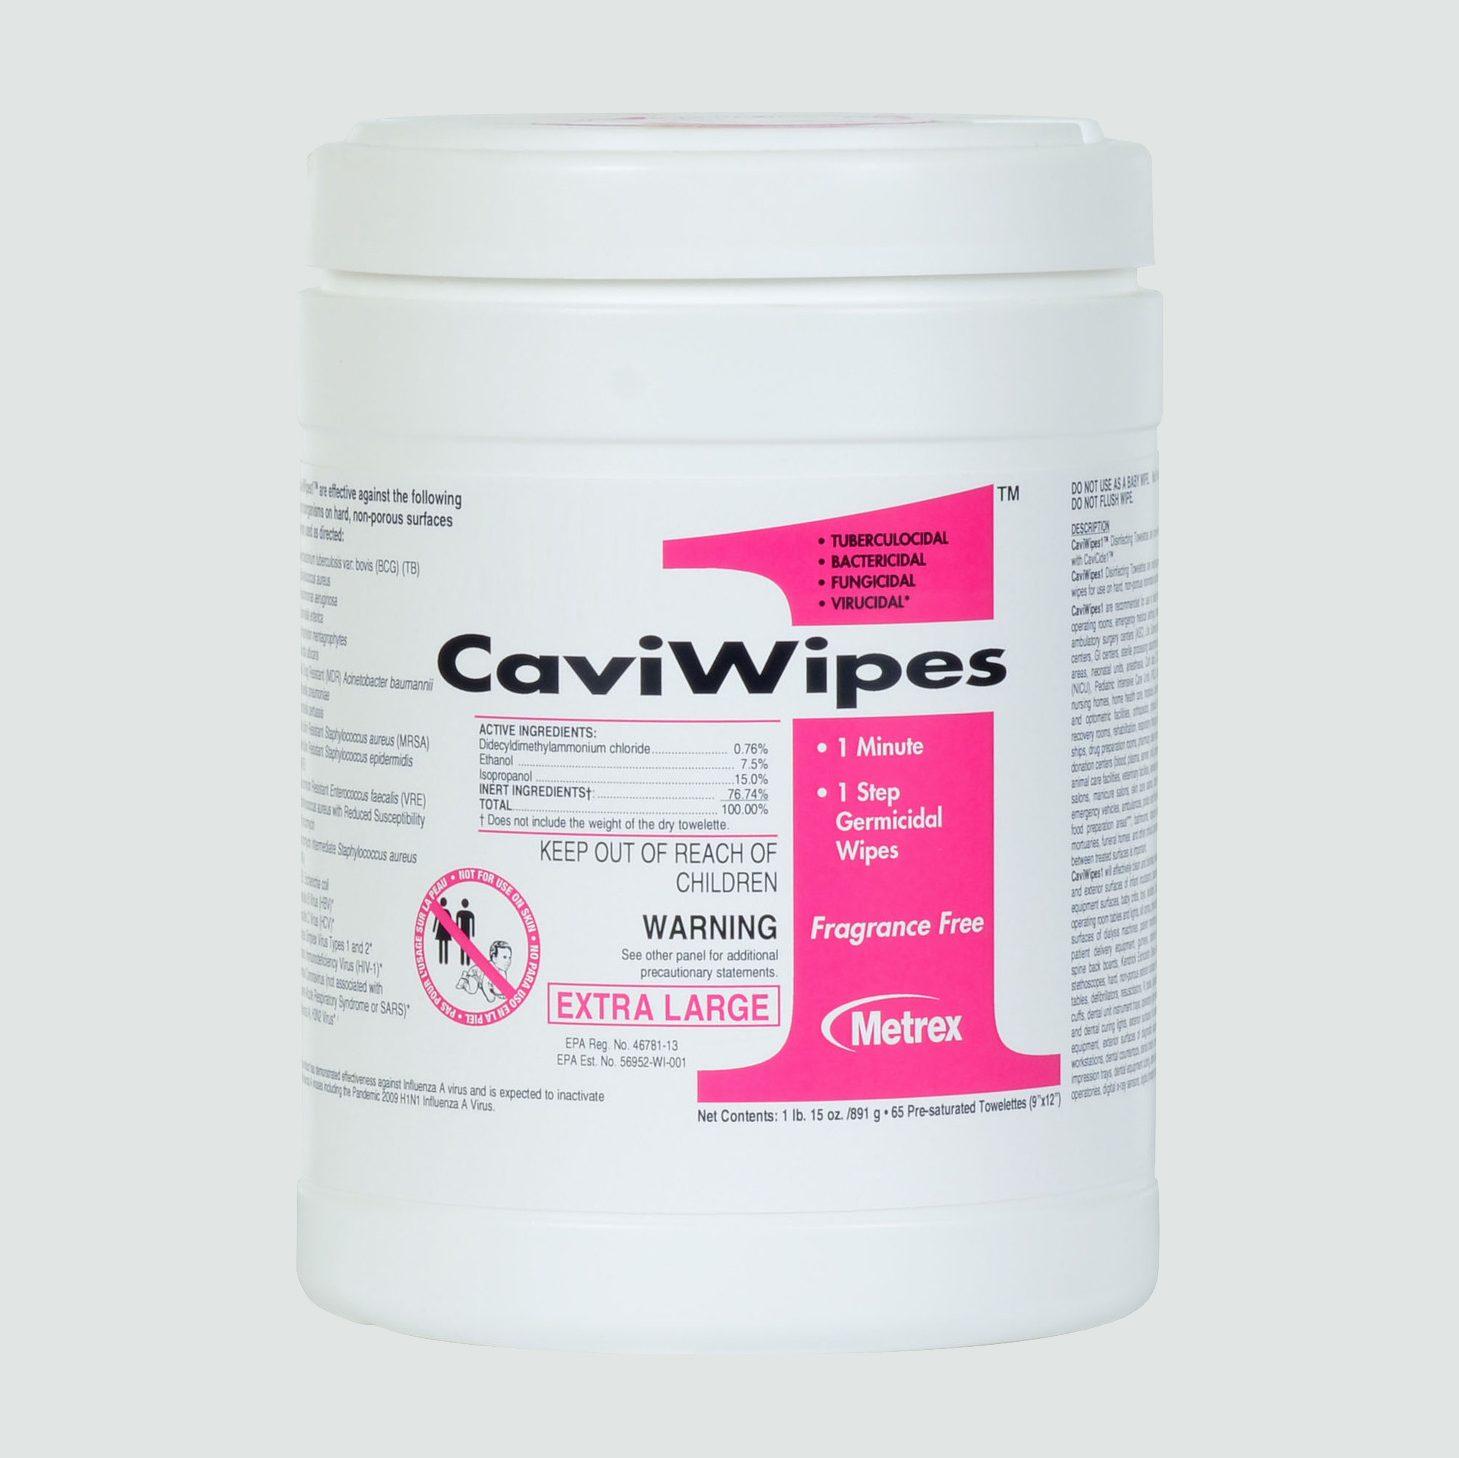 CaviWipes1